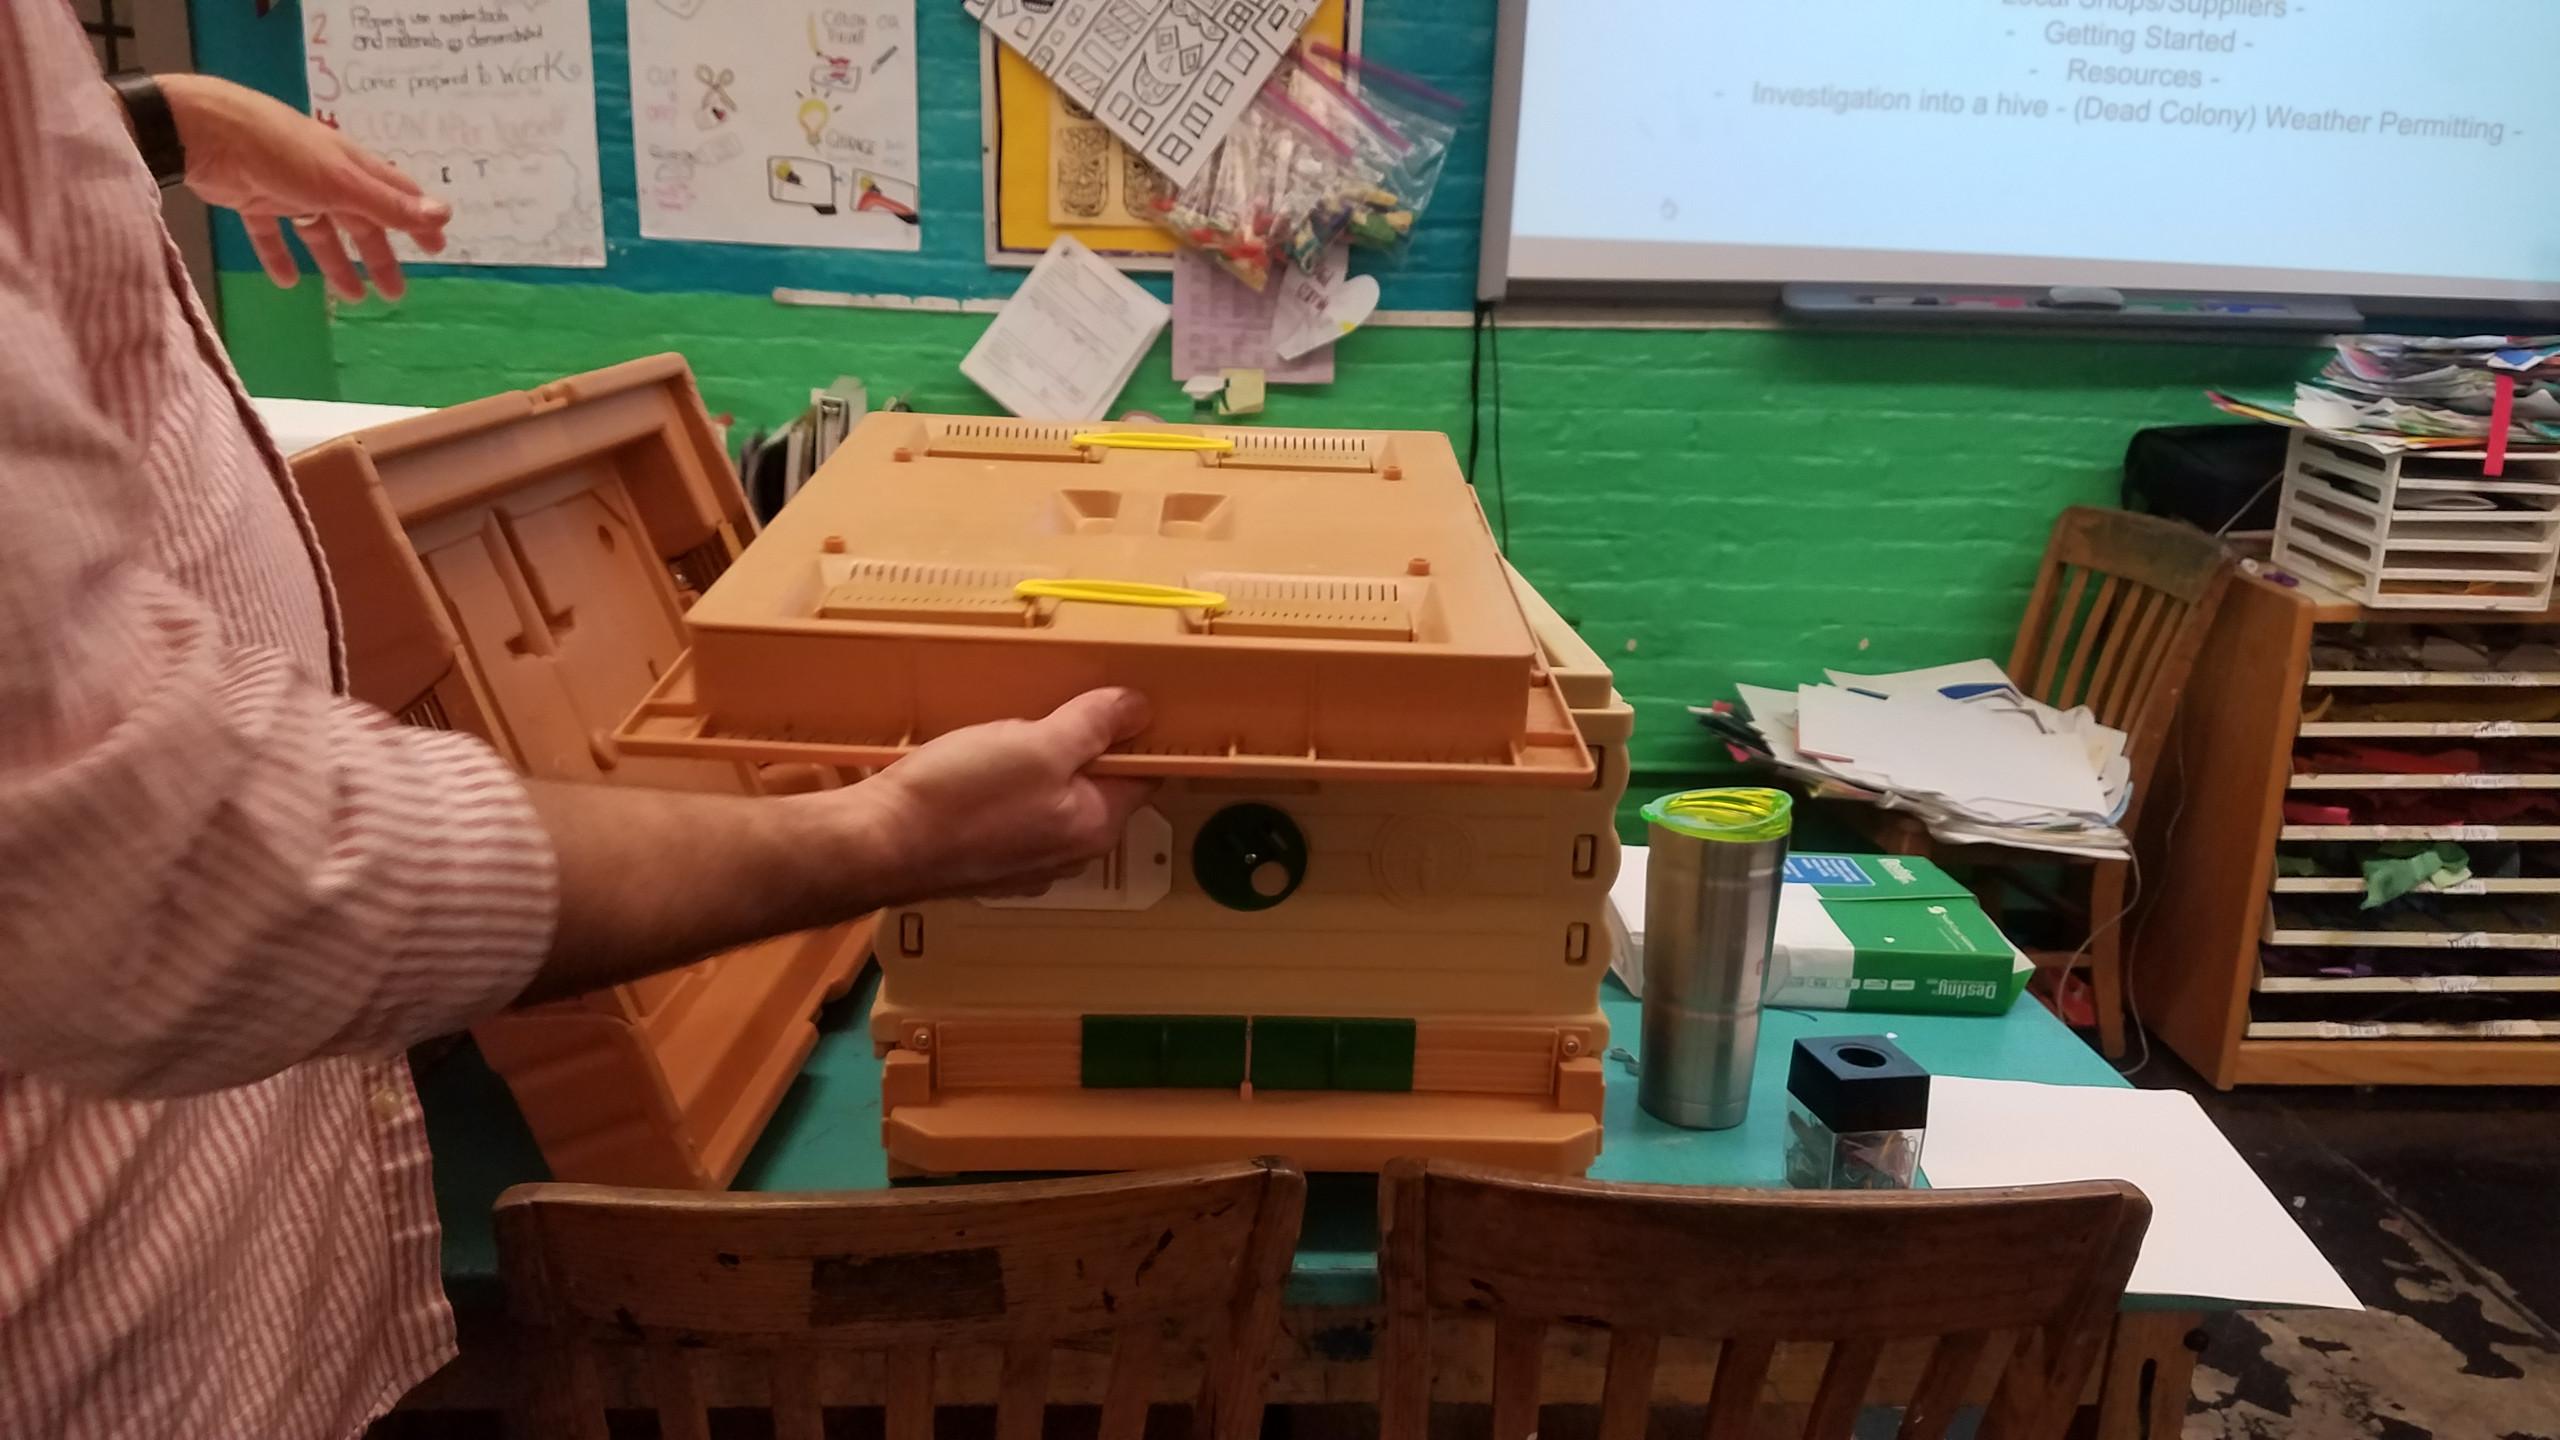 A plastic beehive